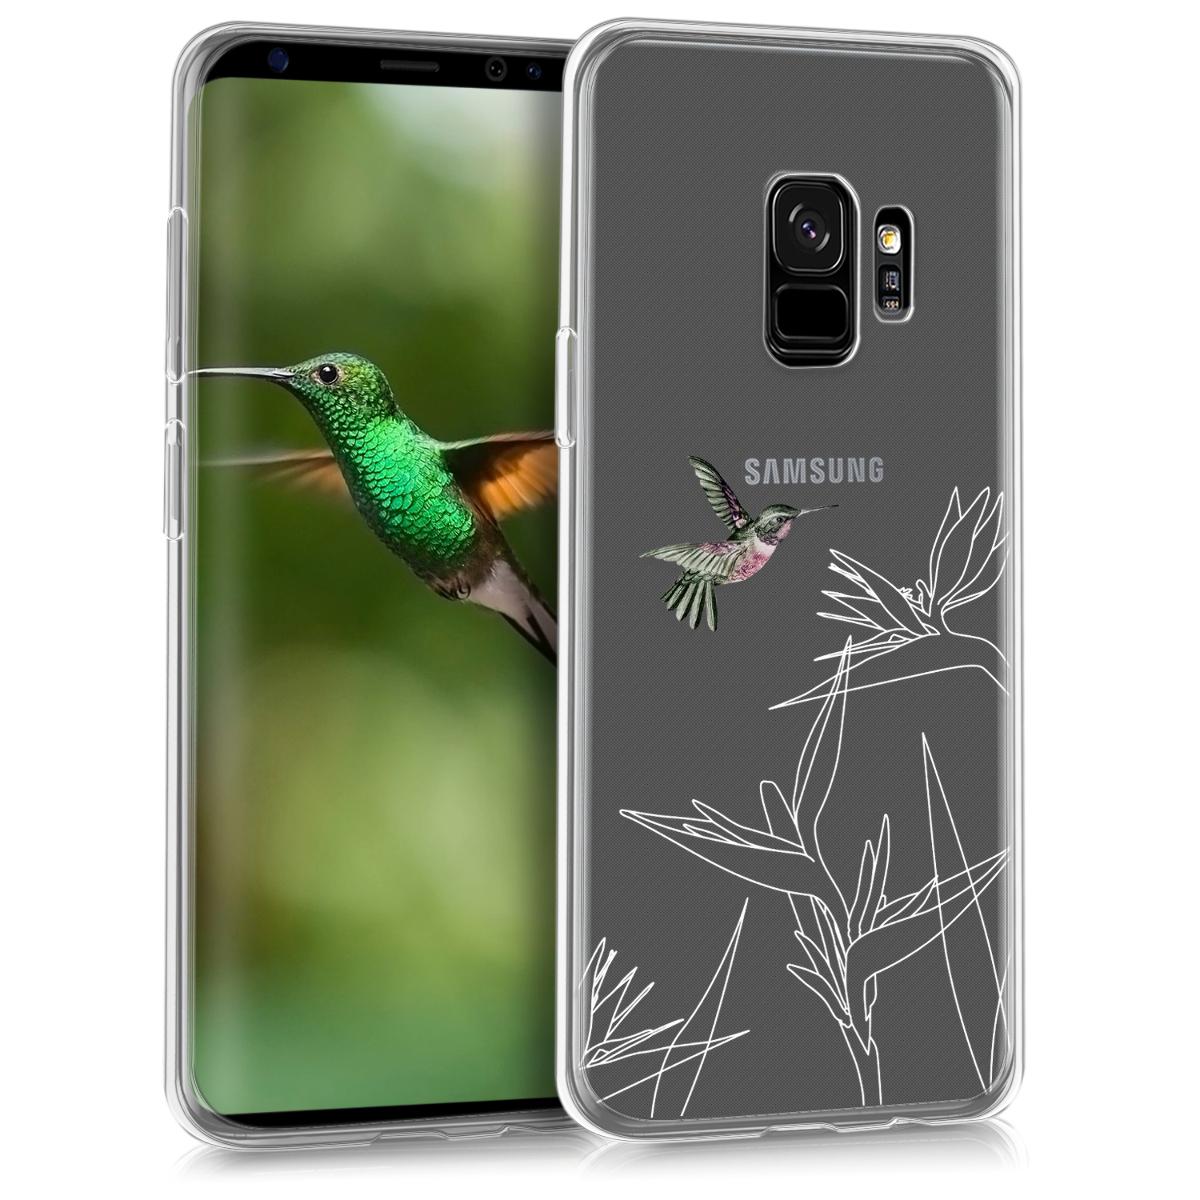 Transparentní pouzdro pro  Samsung Galaxy S9 - TPU Smartphone Backcover - Hummingbird and Flowers Dark Pink / White / Transparent